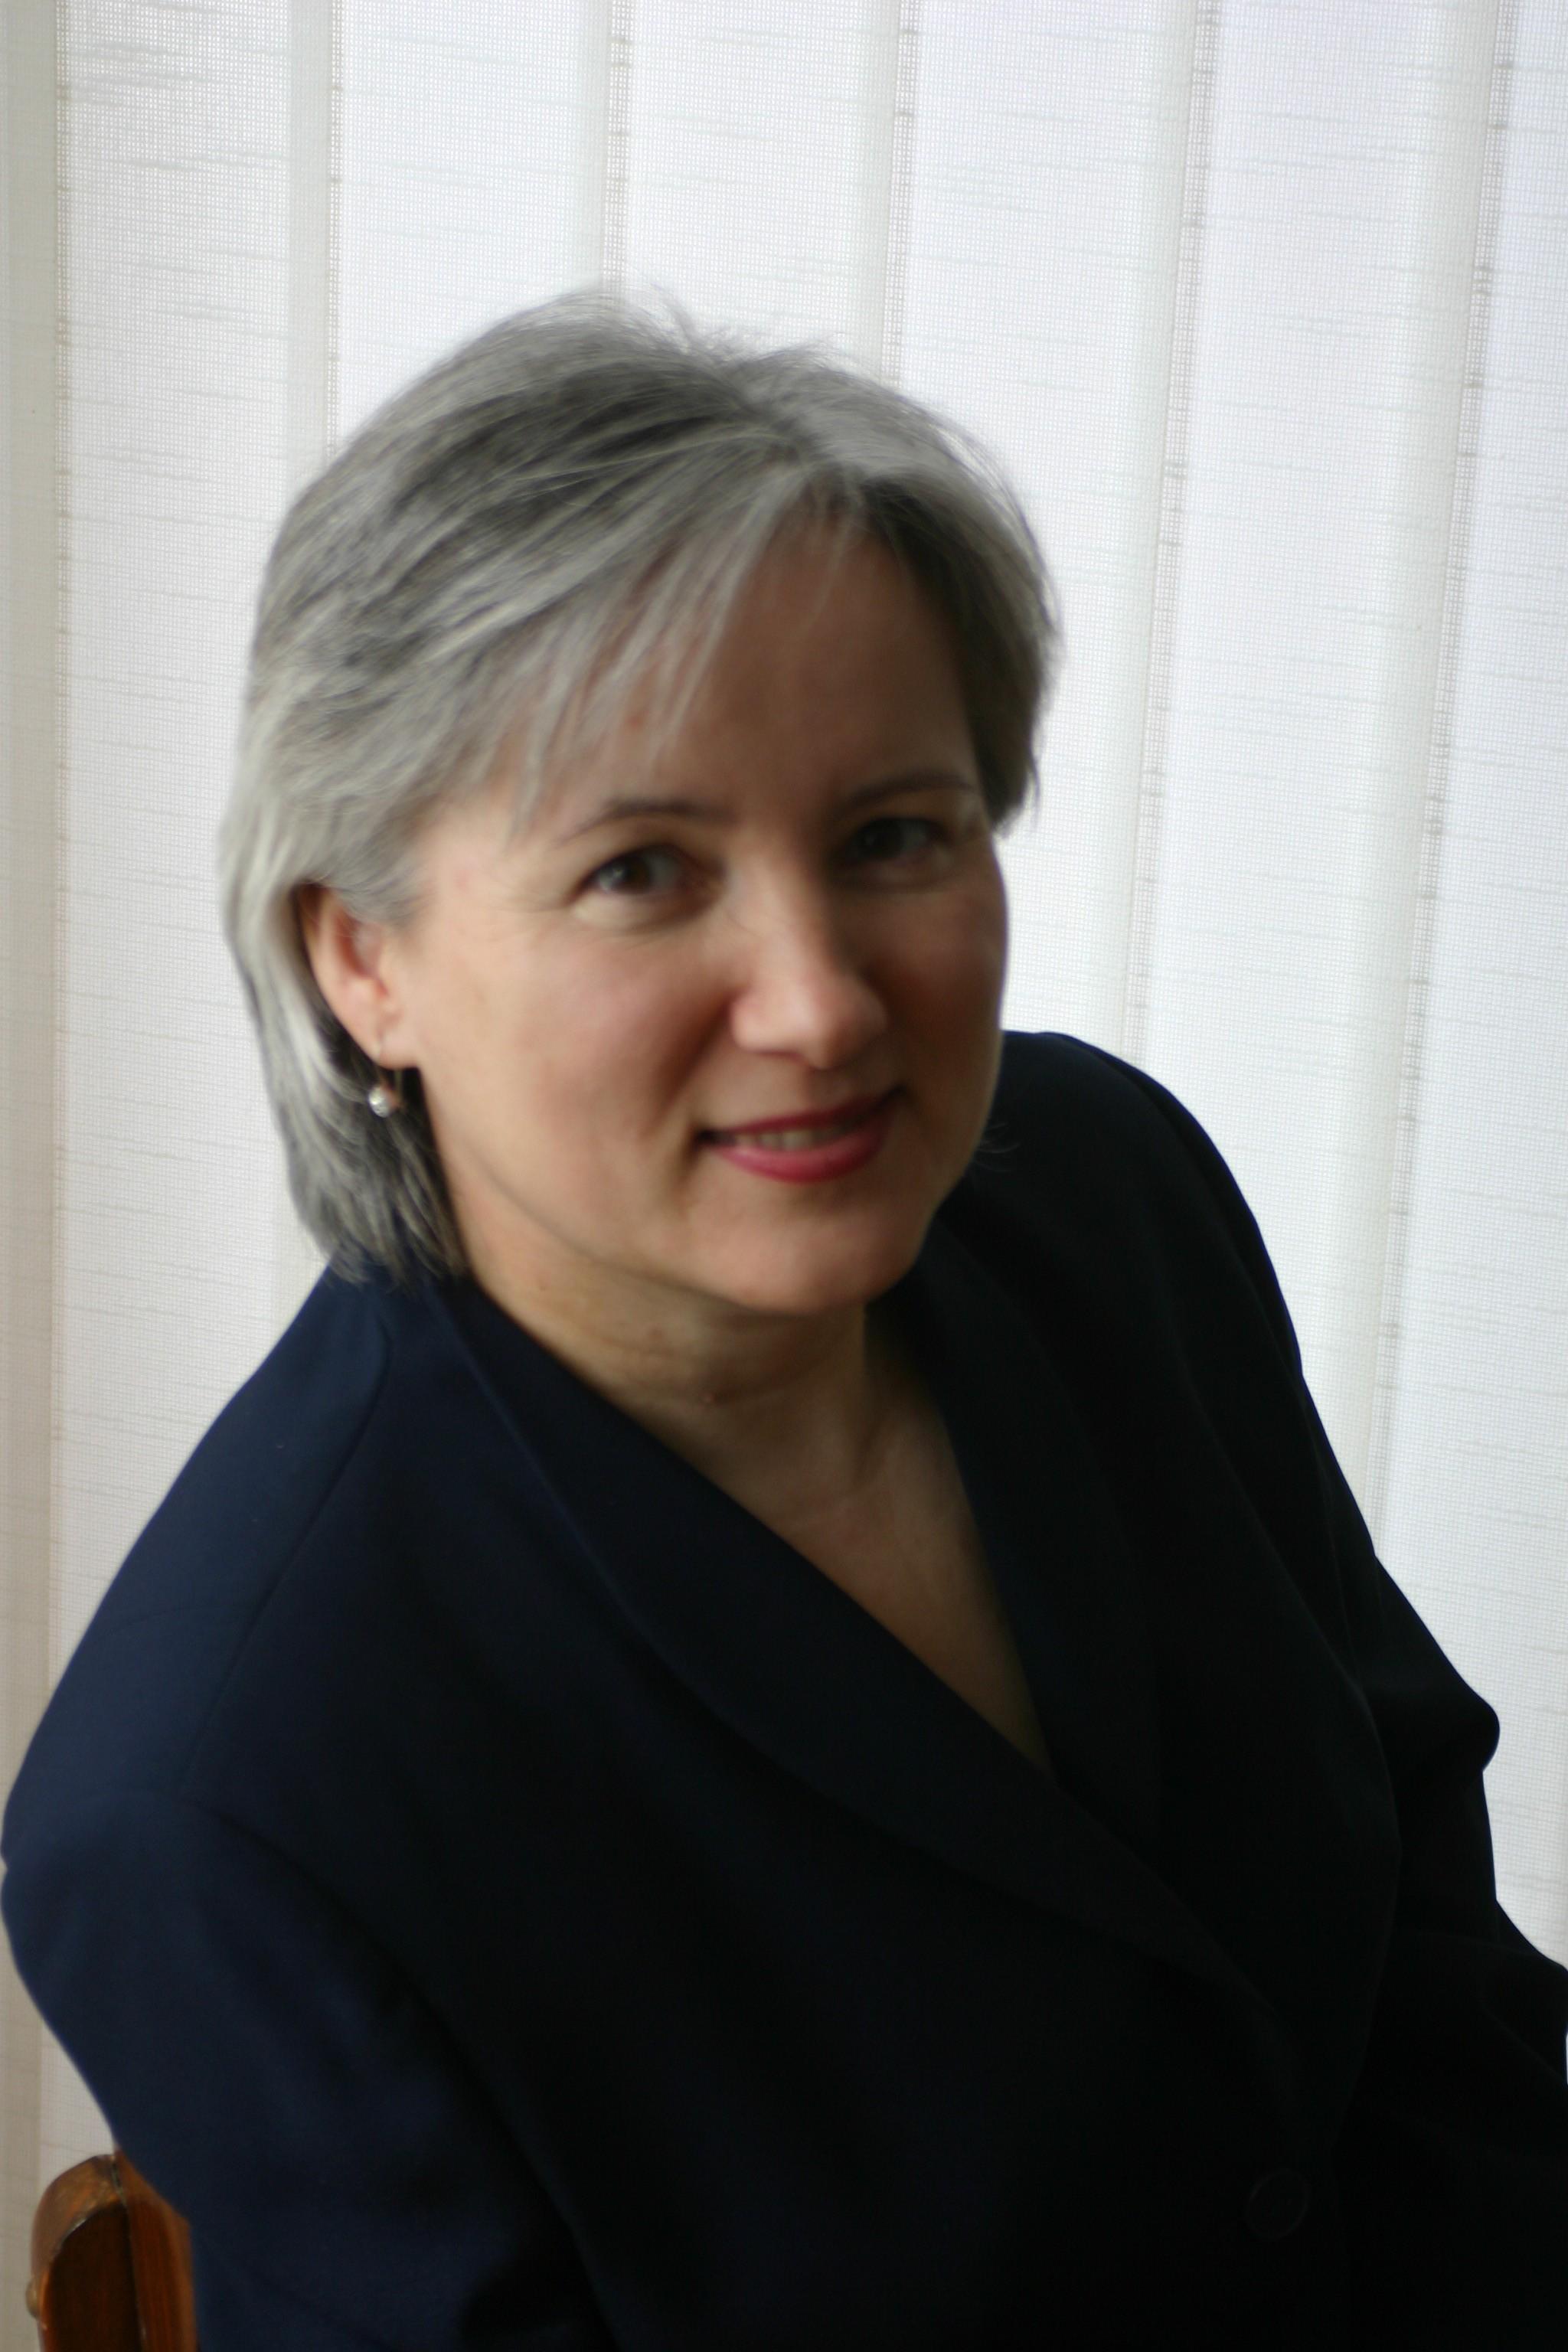 Klara Giertlova